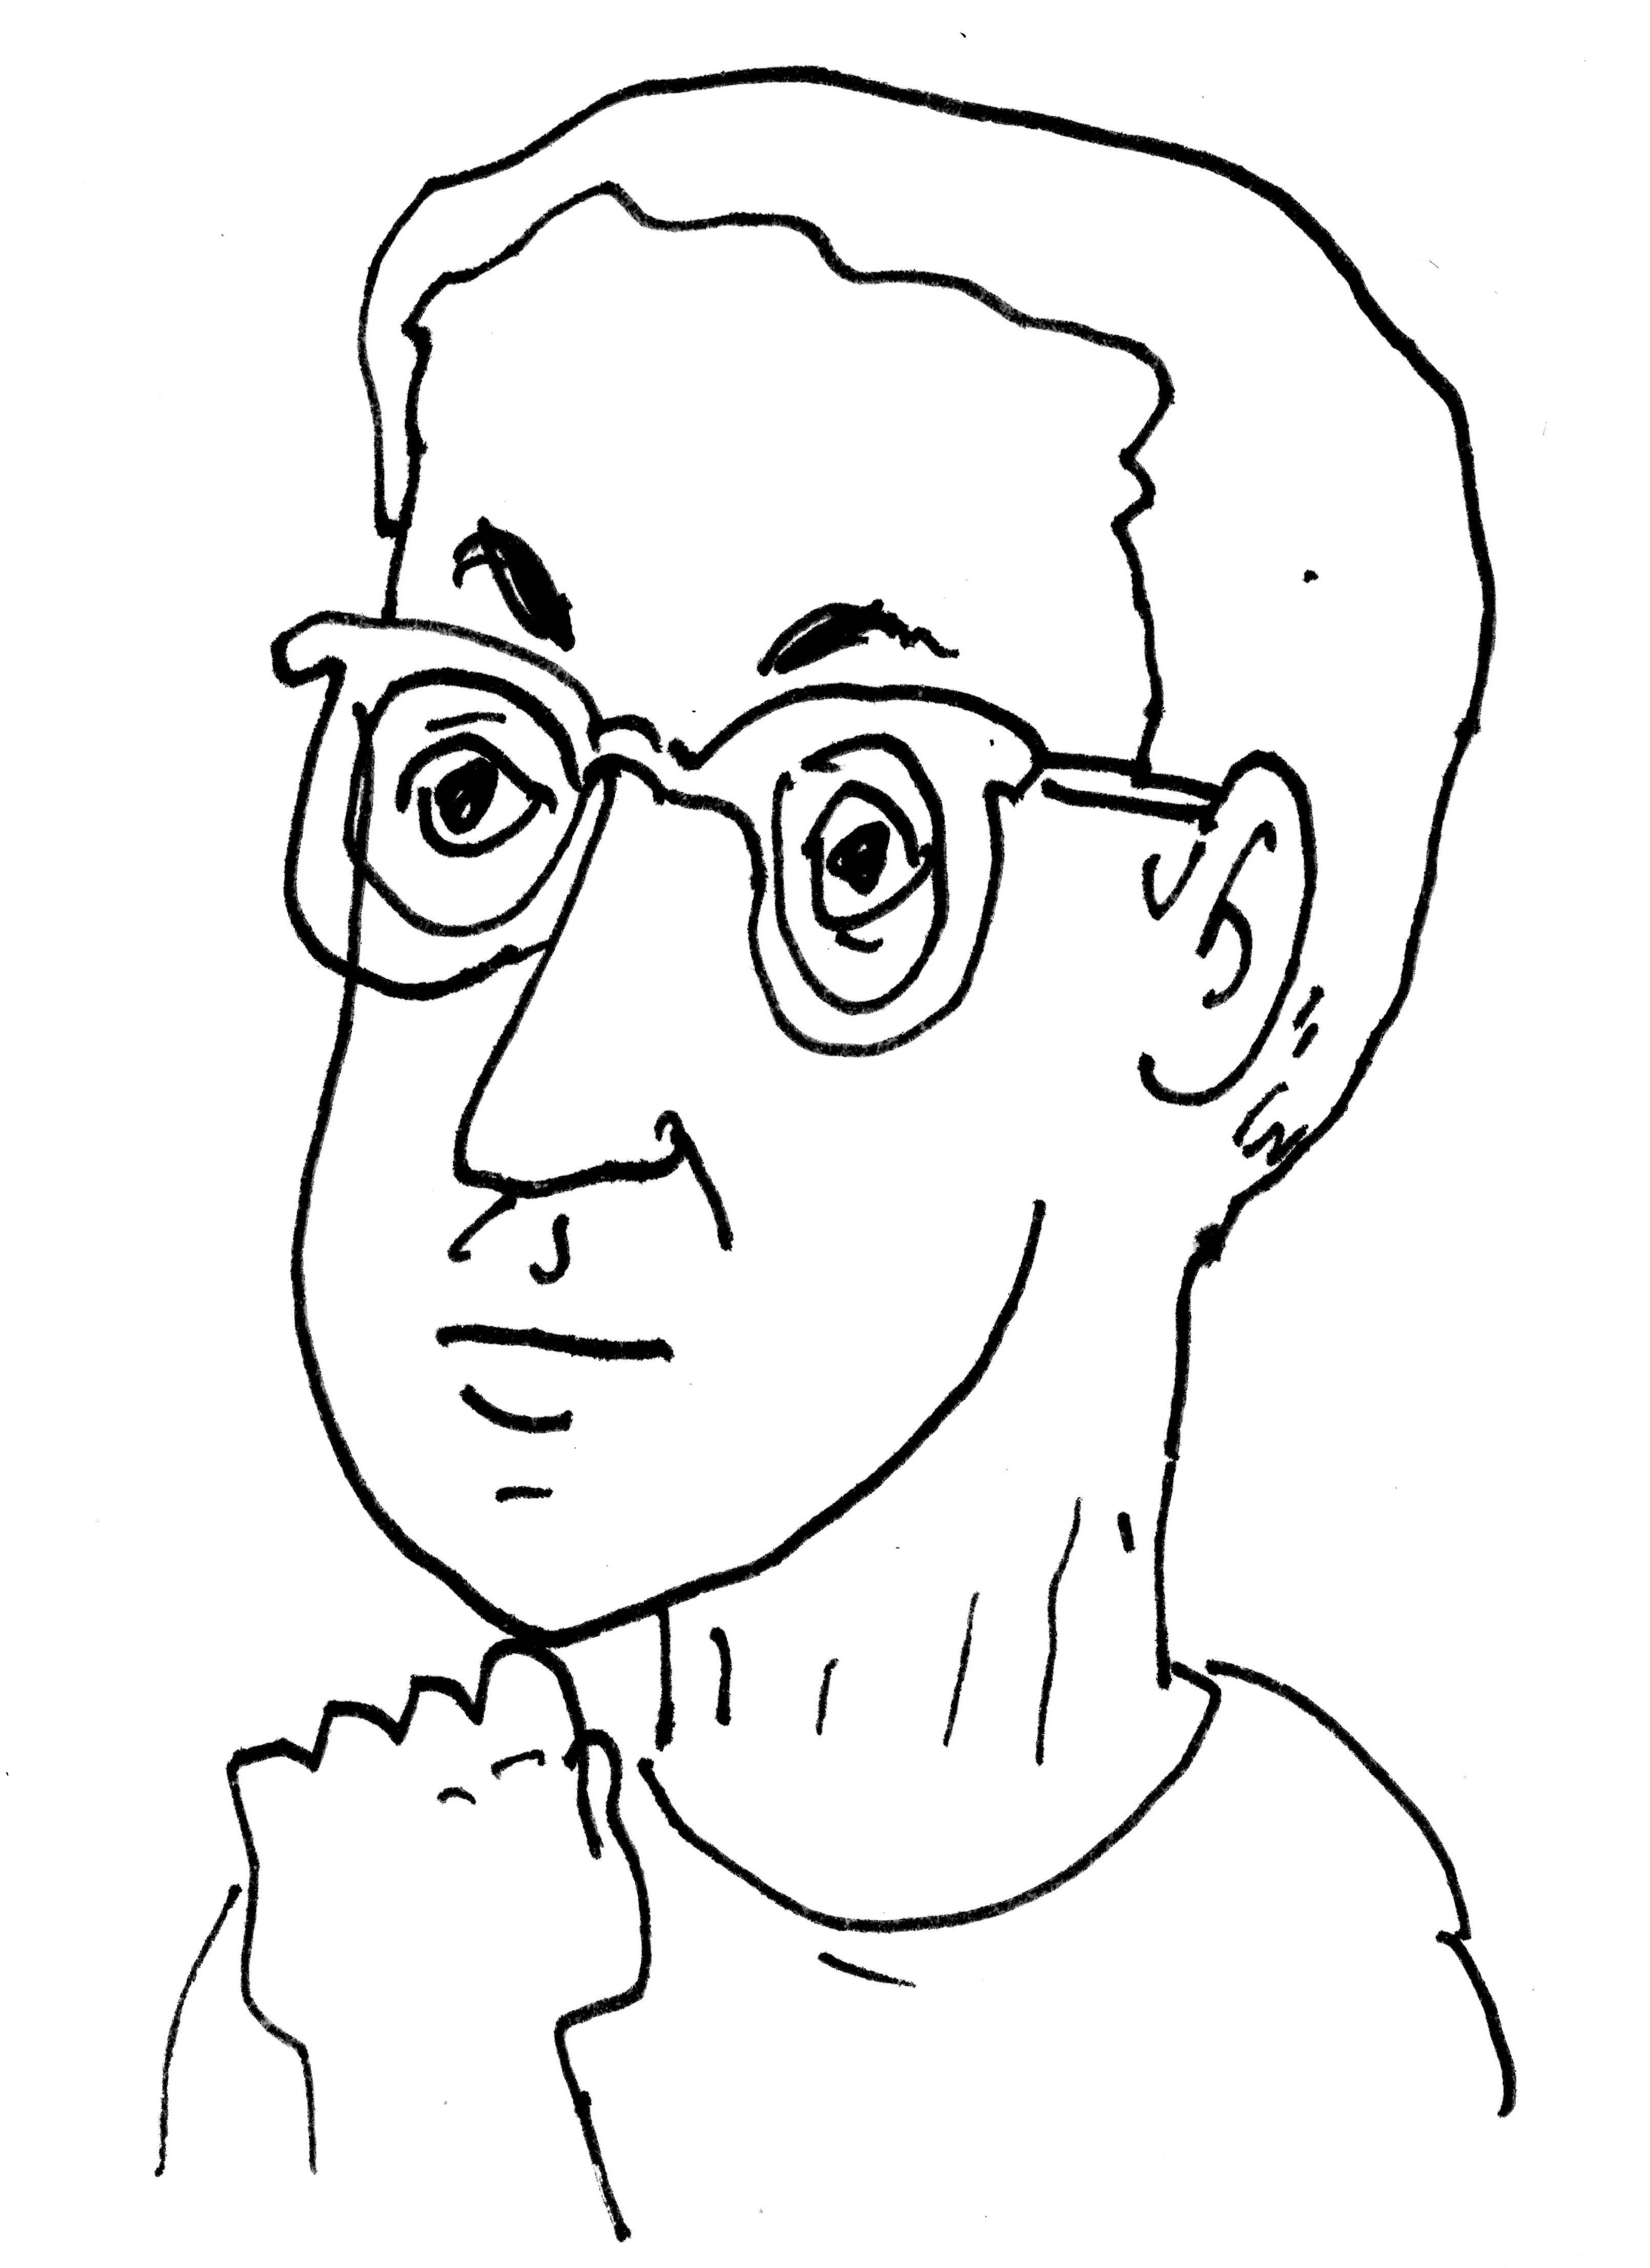 Writer, artist, curator and cartoonist Matt Freedman teaches in the Visual Studies program at the University of Pennsylvania.